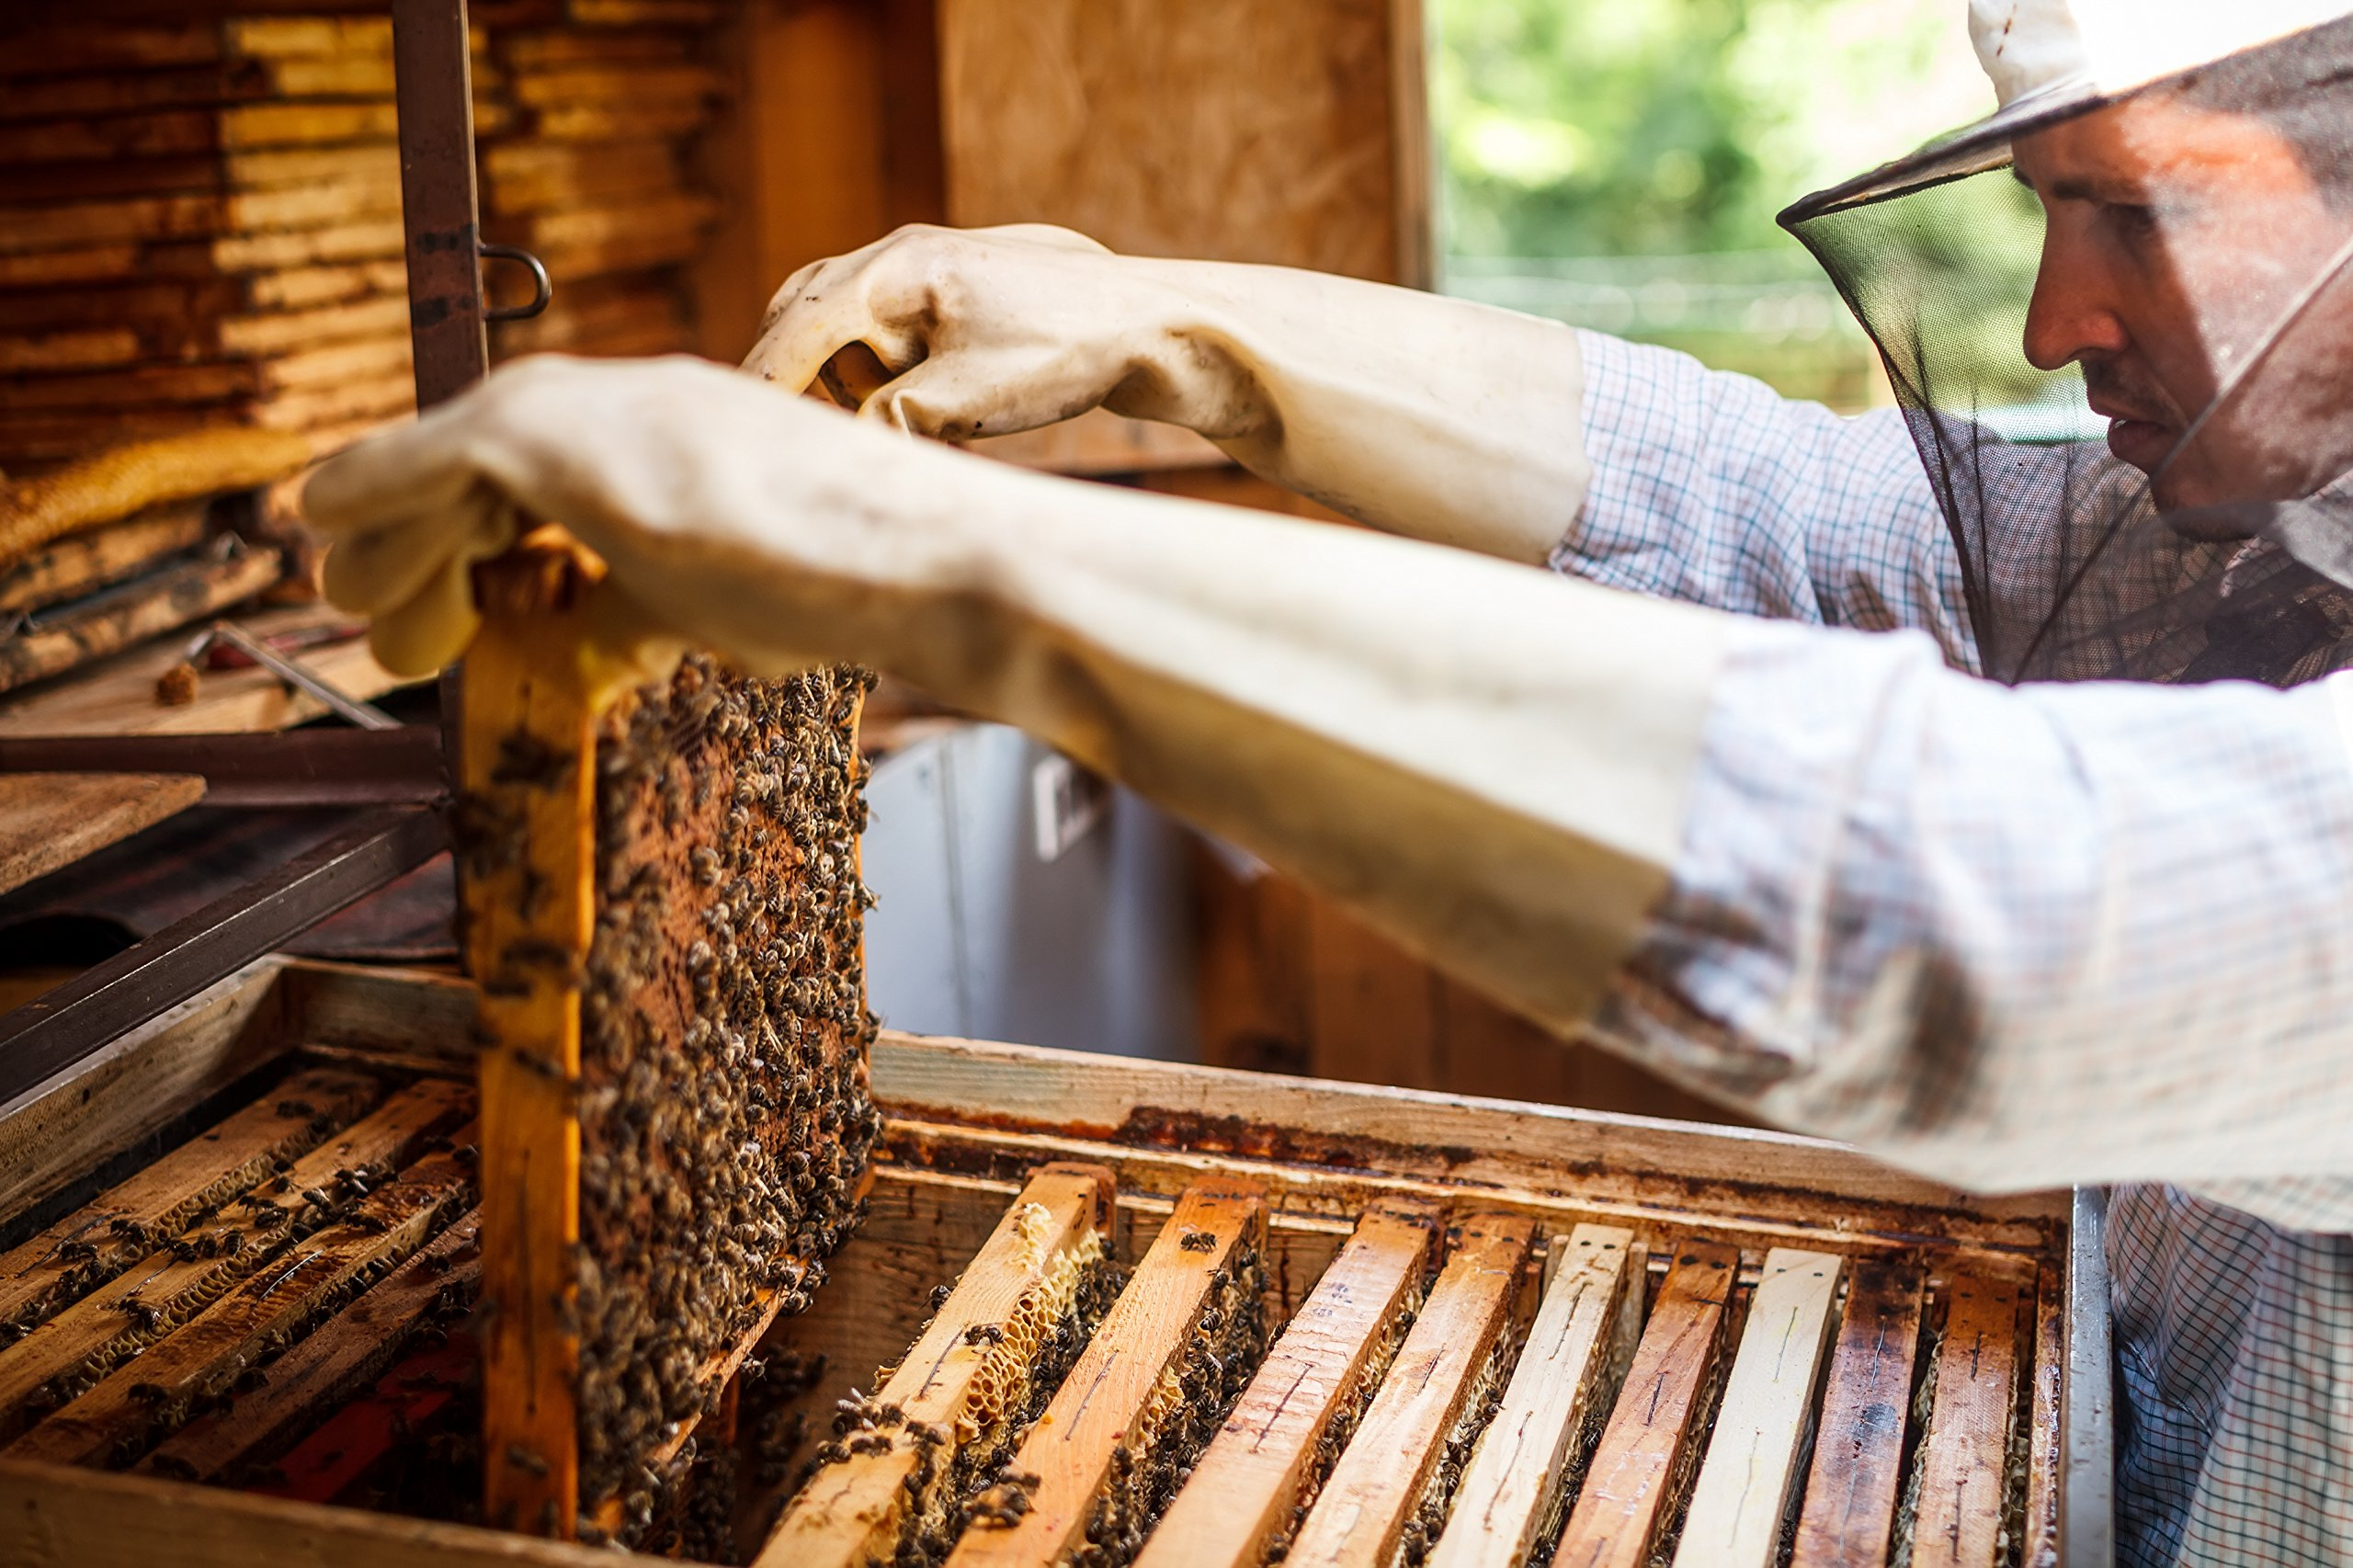 Pure New Zealand Manuka Honey - UMF 20+ Certified - 8.8 oz- All Blacks Official Licensed Honey by Mercier Kitchen (Image #2)